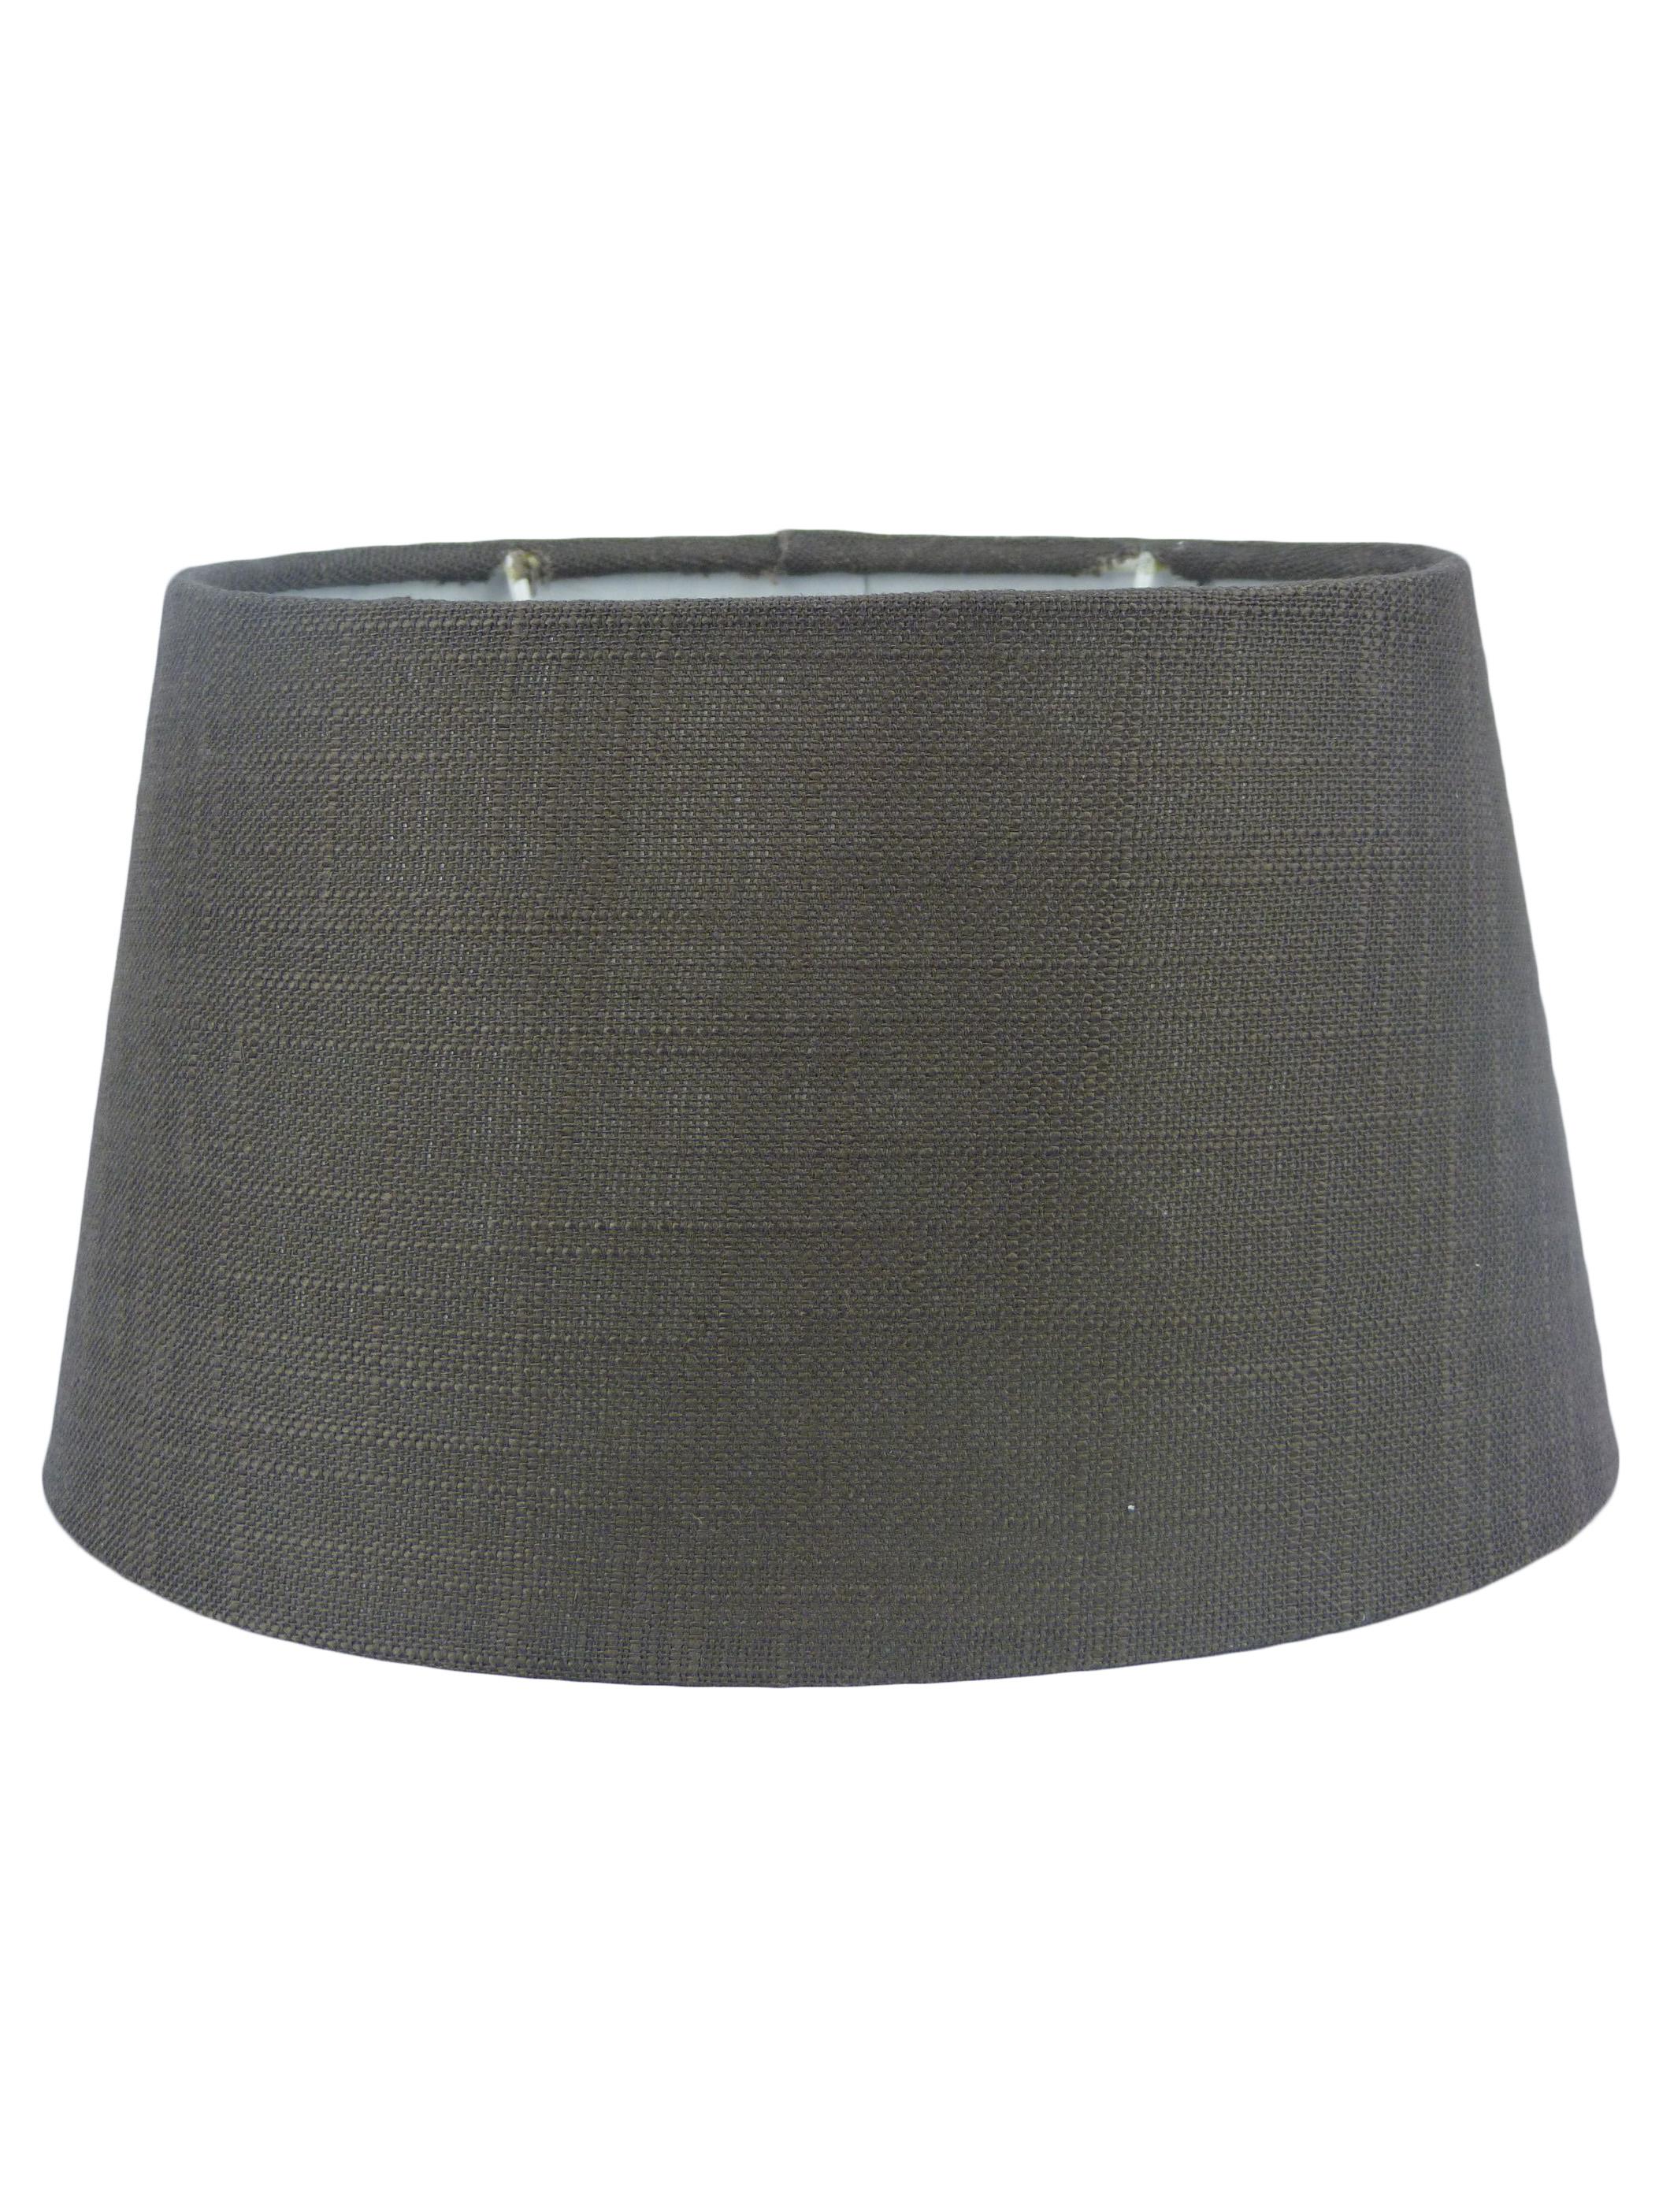 lampenschirm stoff textil leinen shabby chic landhaus. Black Bedroom Furniture Sets. Home Design Ideas